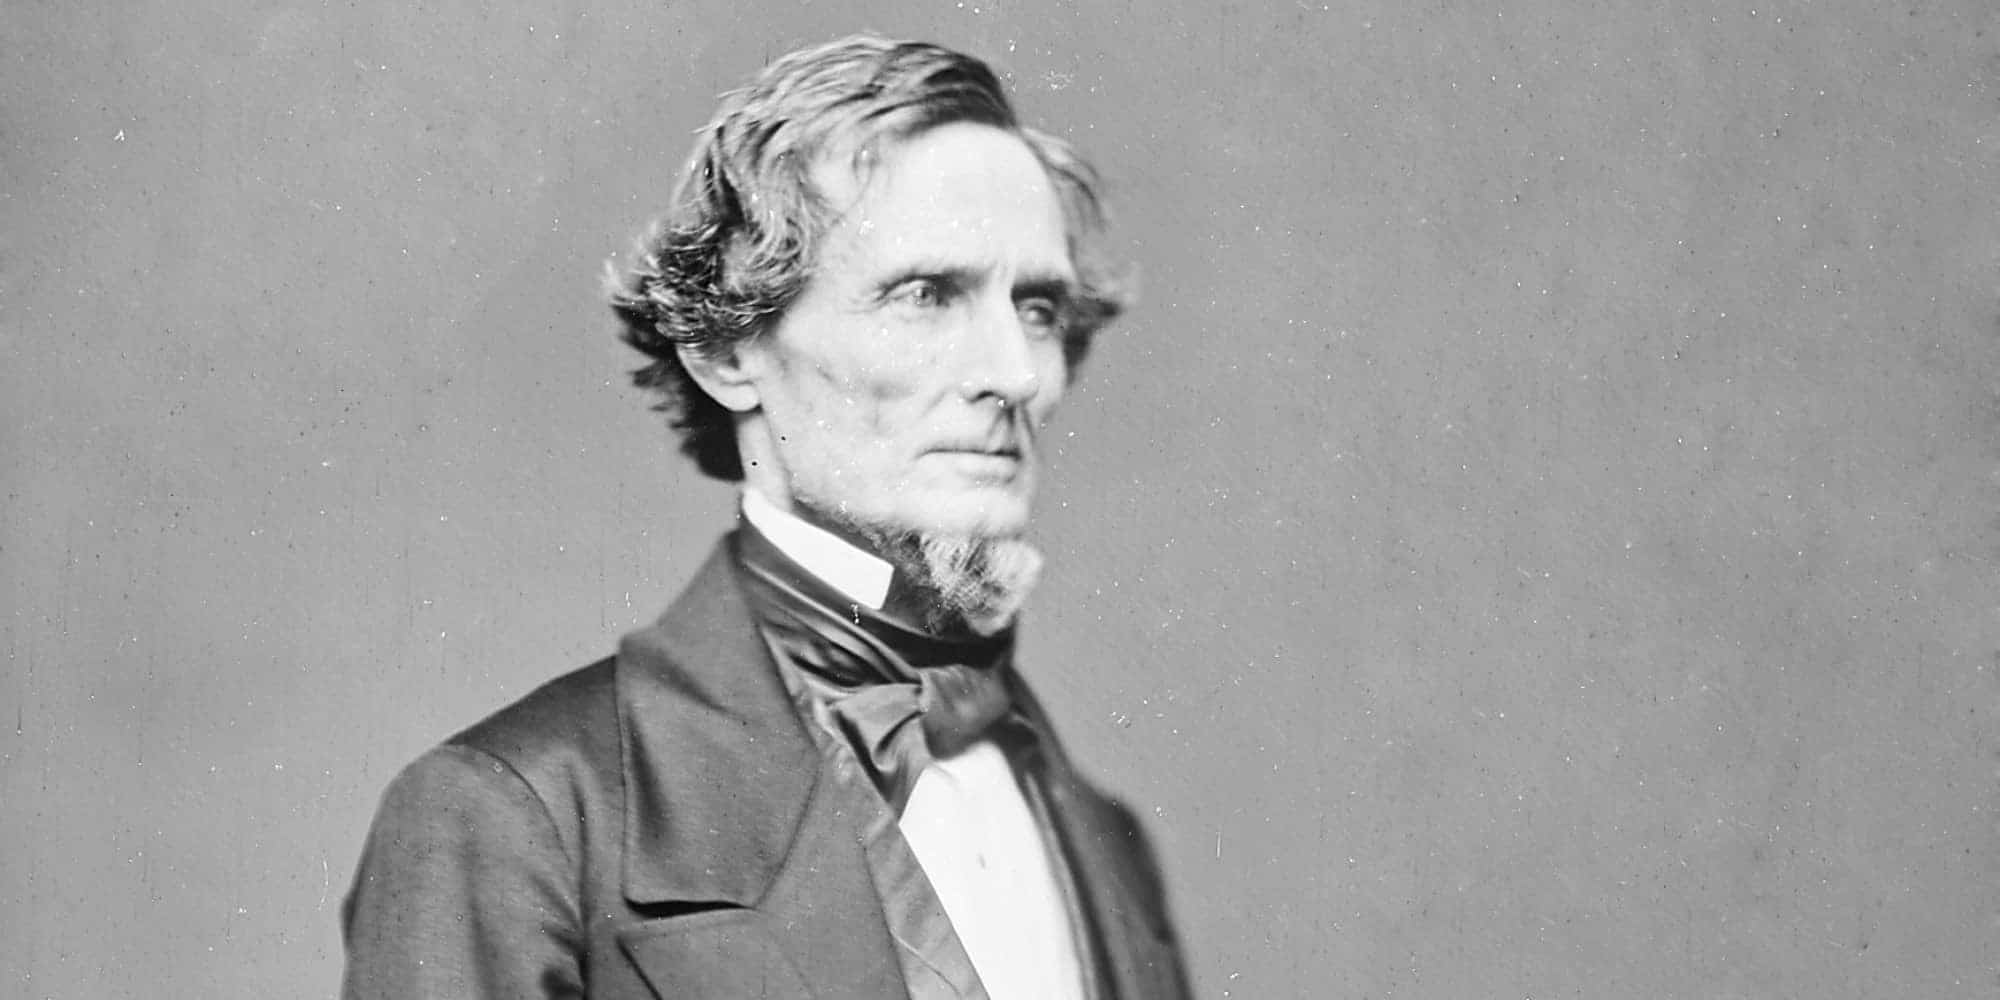 Jefferson Davis (1808